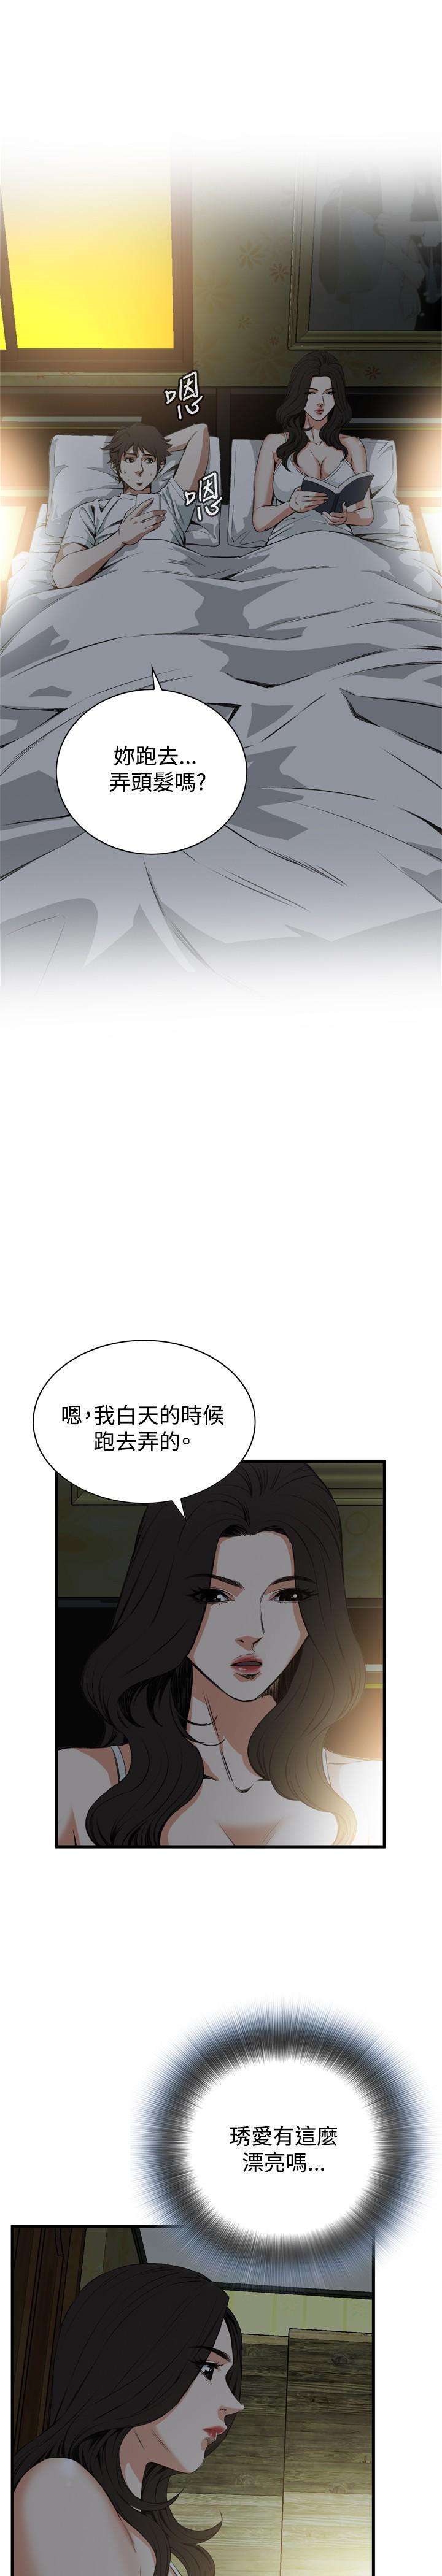 Take a Peek 偷窥 Ch.39~55 [Chinese]中文 187